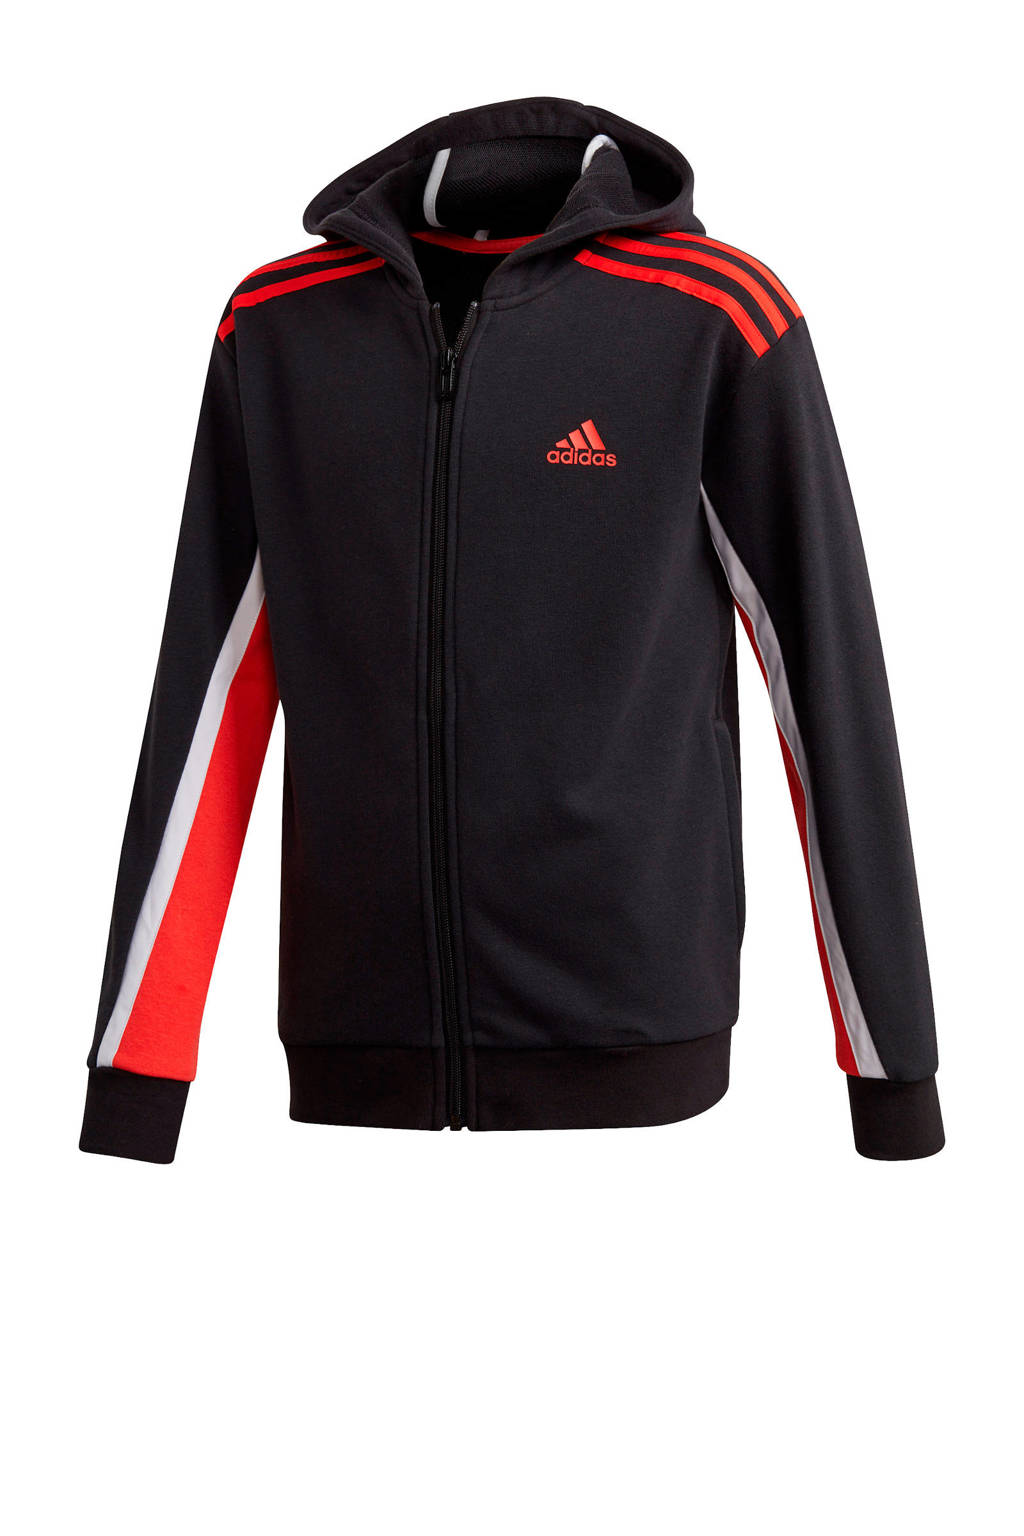 adidas Performance   sportvest zwart/rood, Zwart/rood